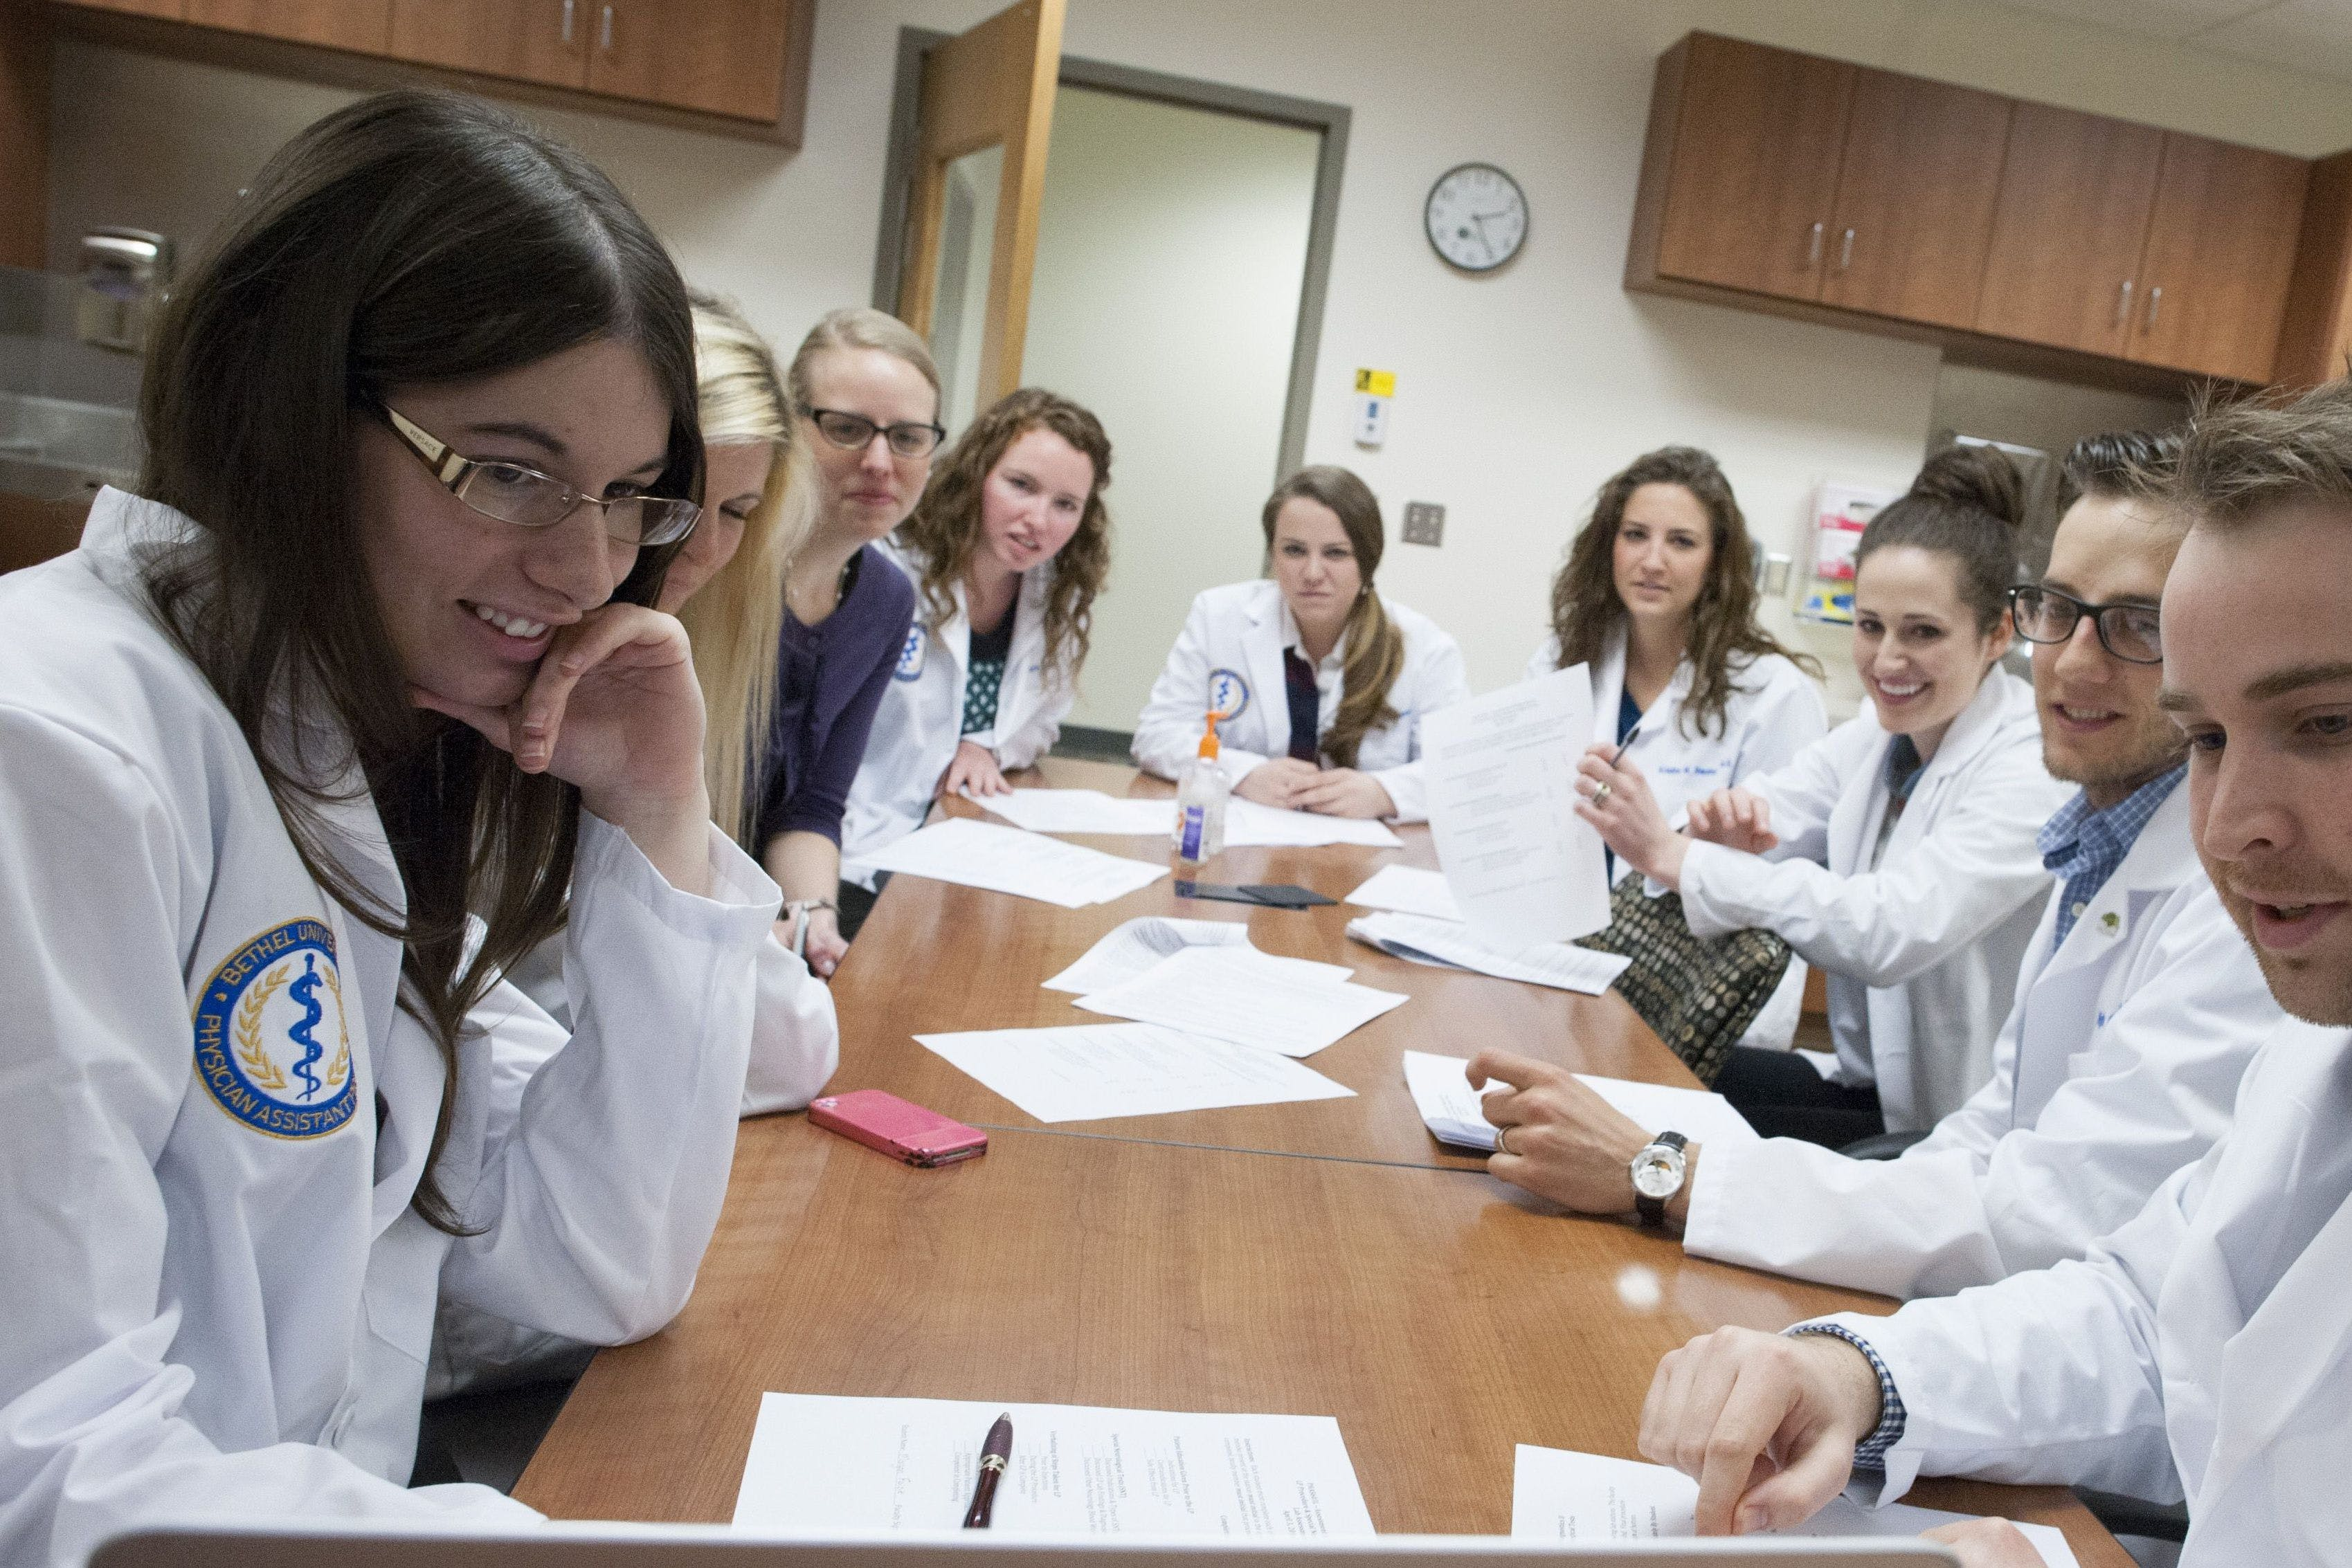 Physician Assistant Program Gains Recognition